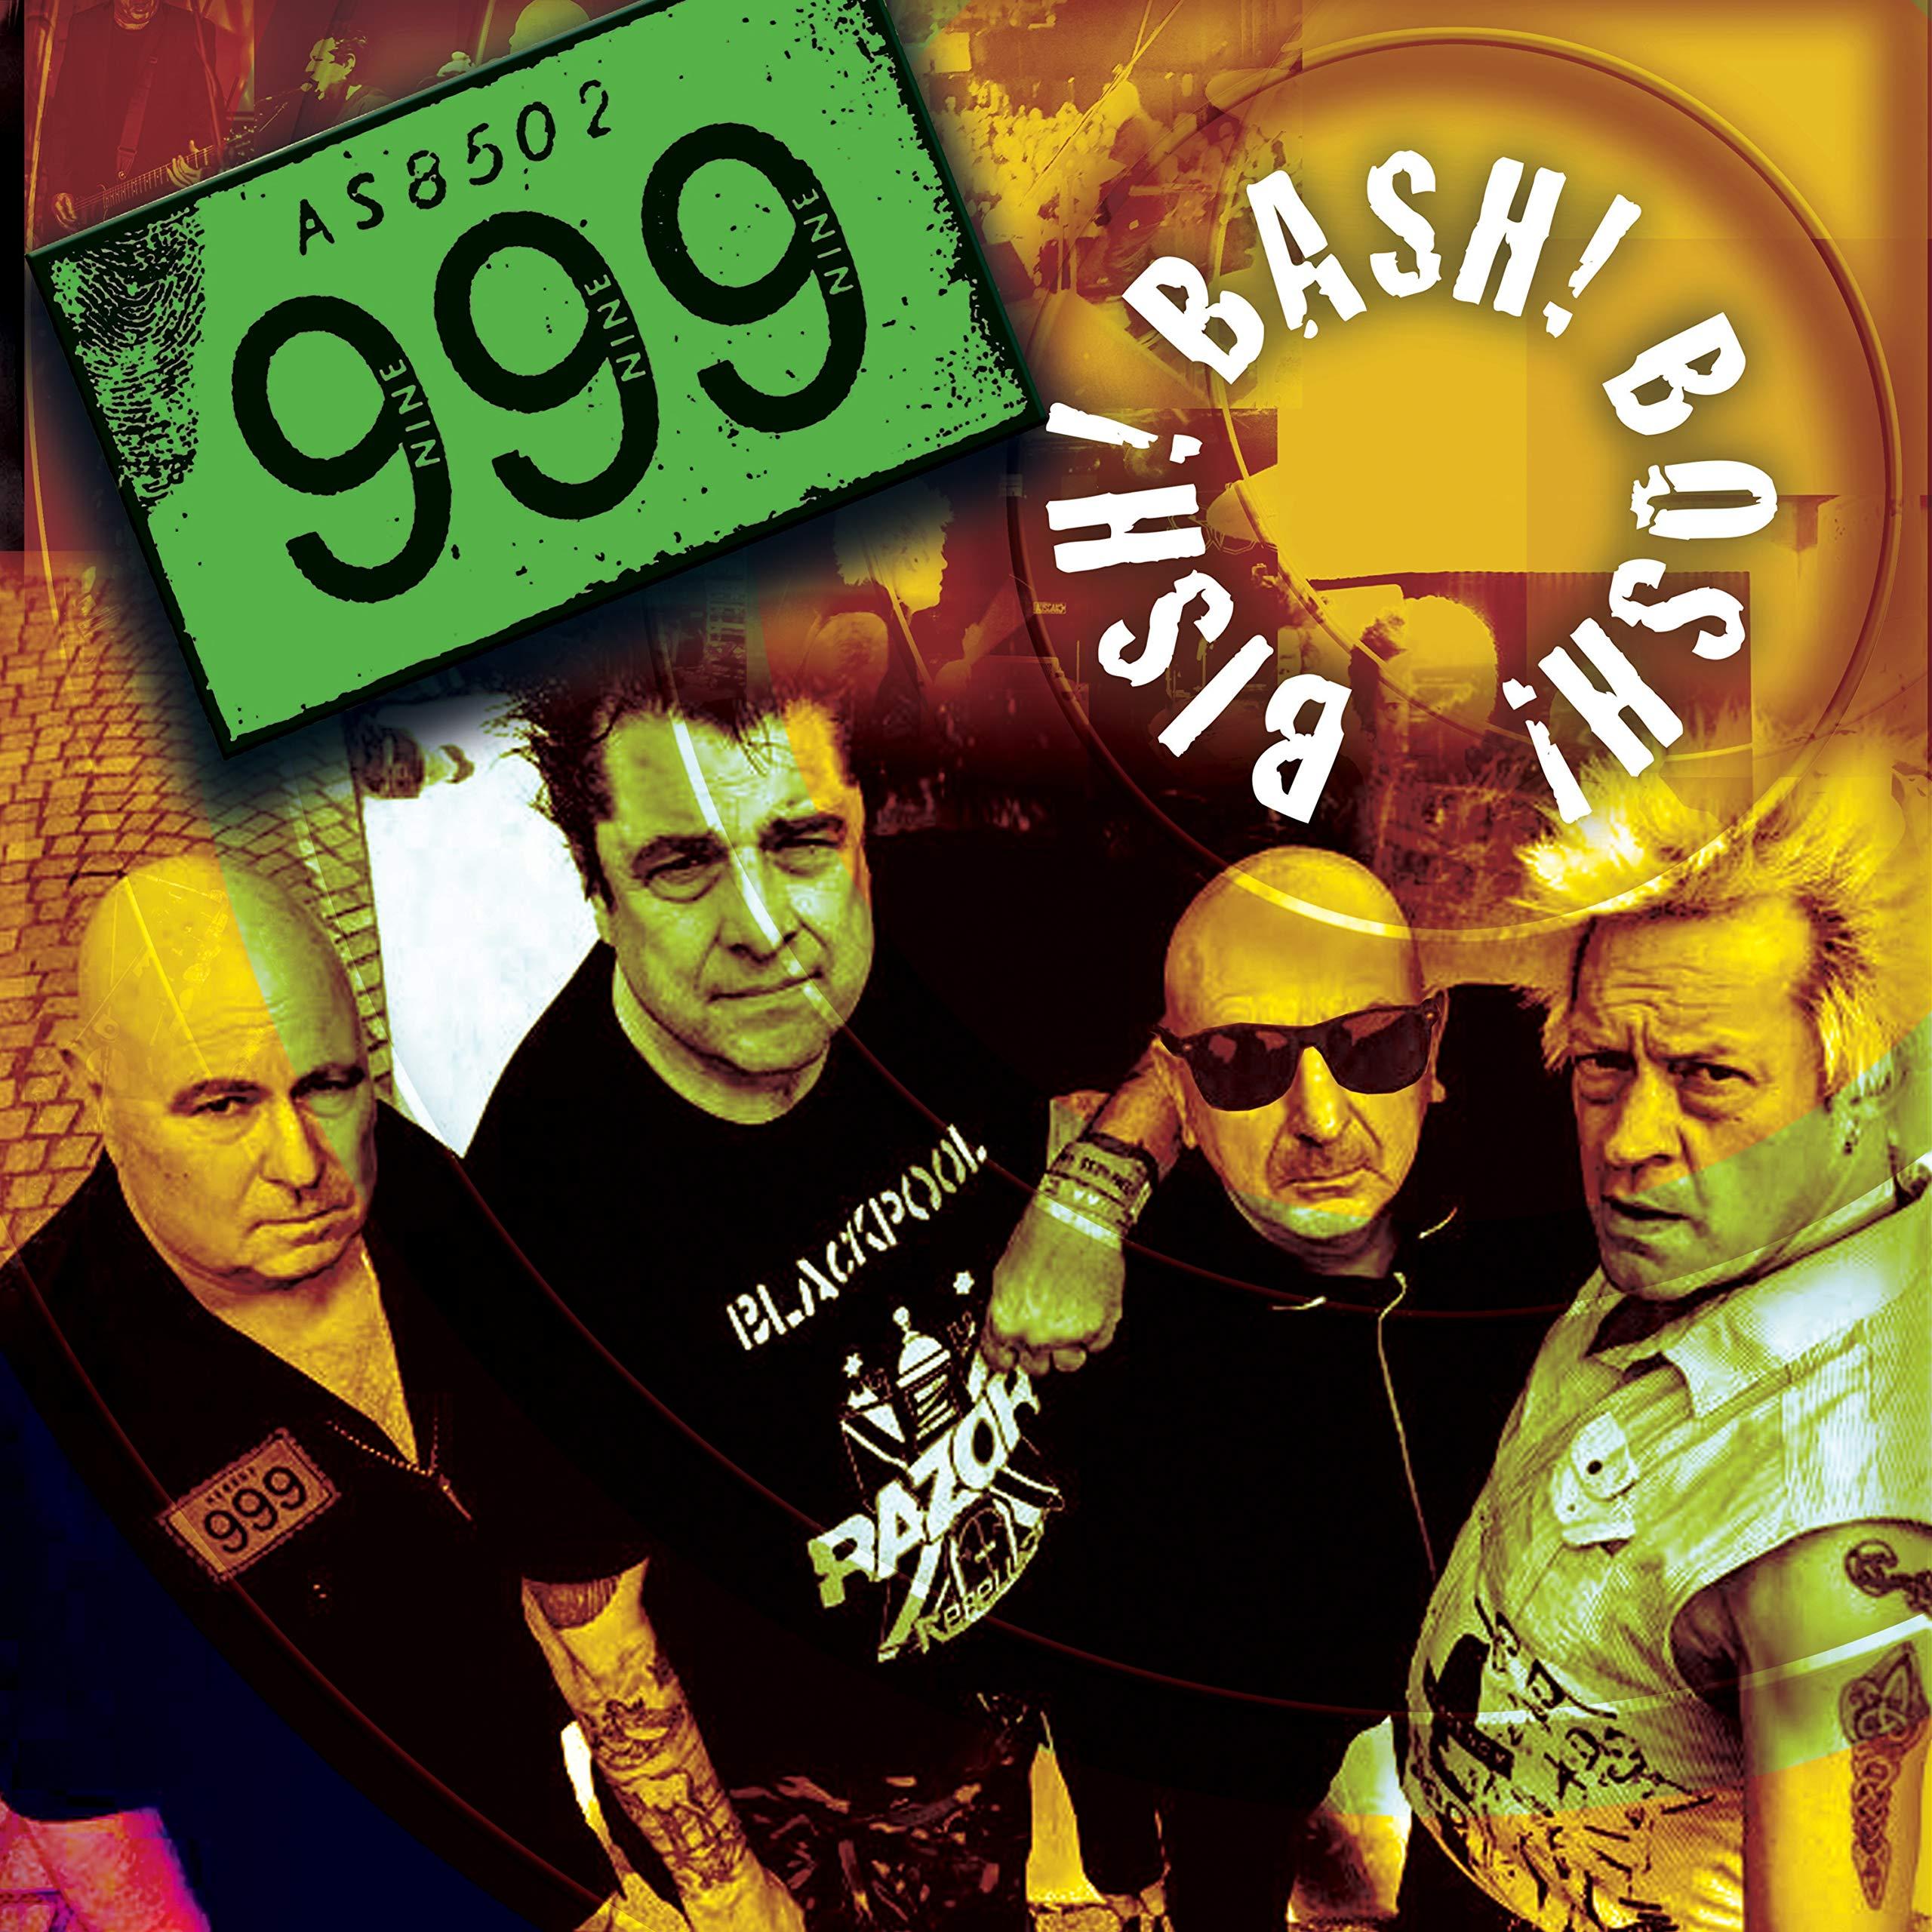 999 - Bish Bash Bosh (2020) [FLAC] Download